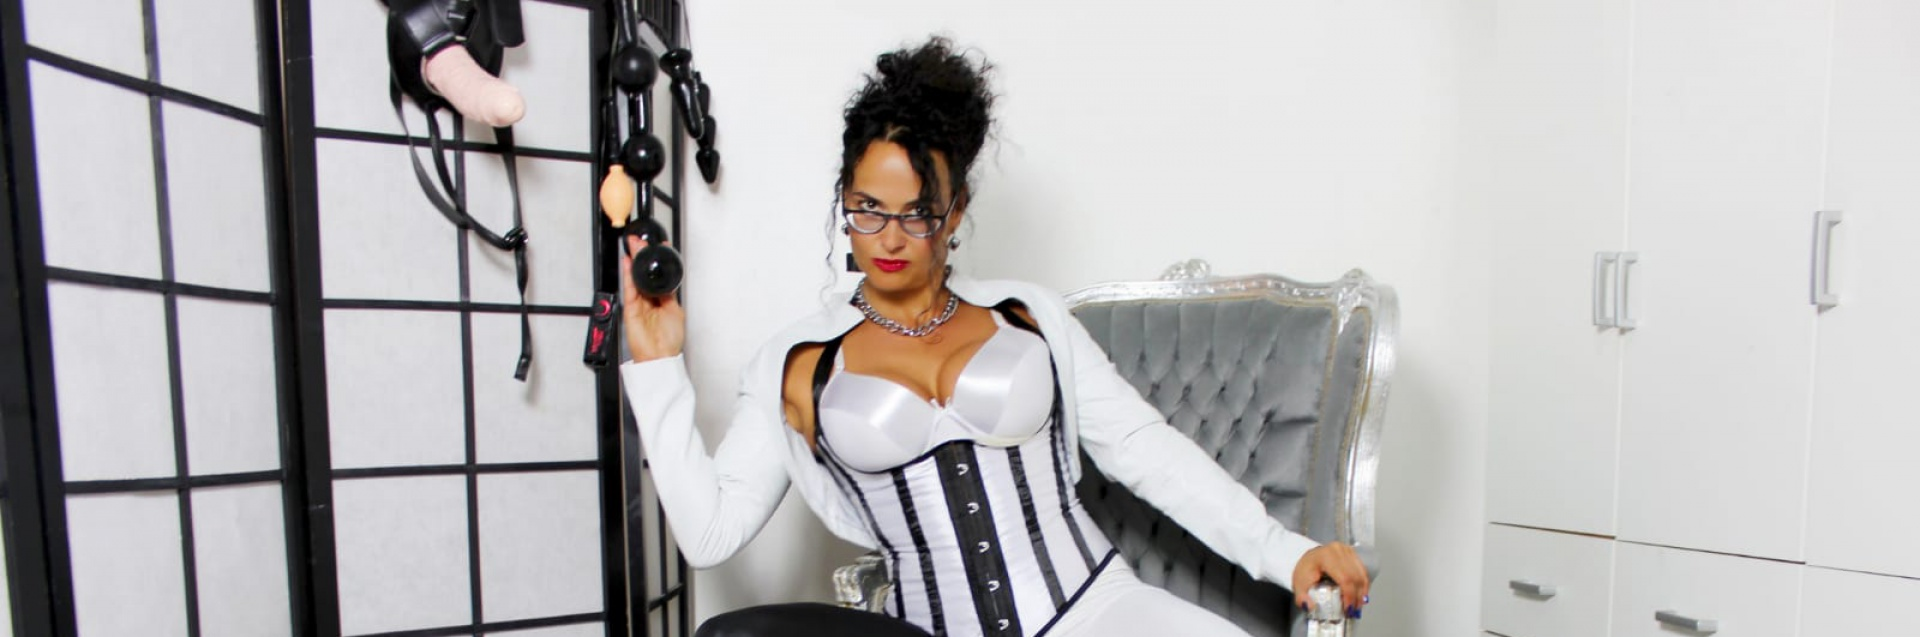 Fetisch Lady Blog